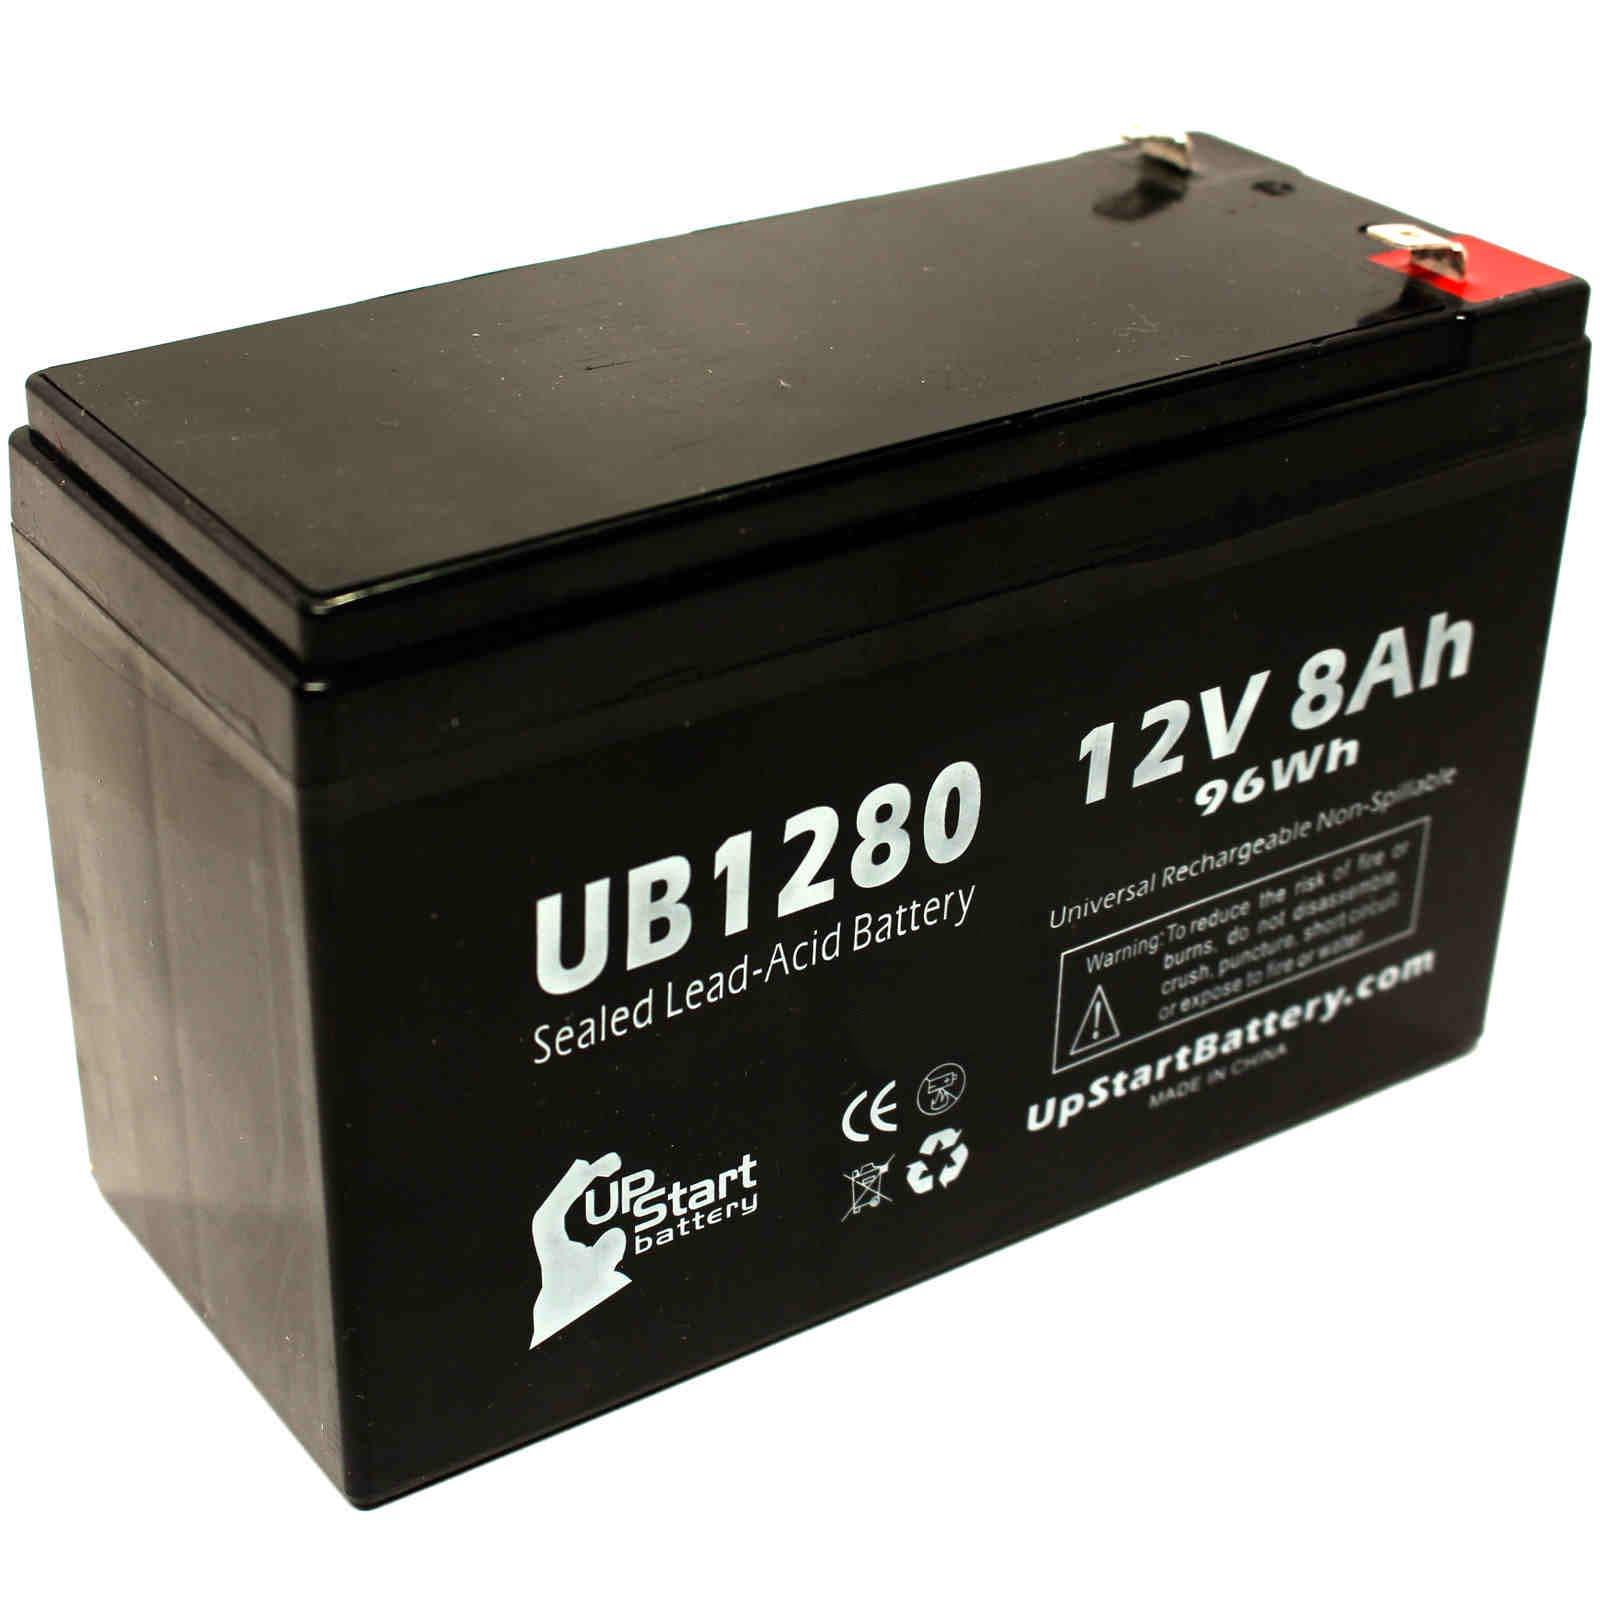 Altronix SMP3PMP8 Compatible Replacement Battery